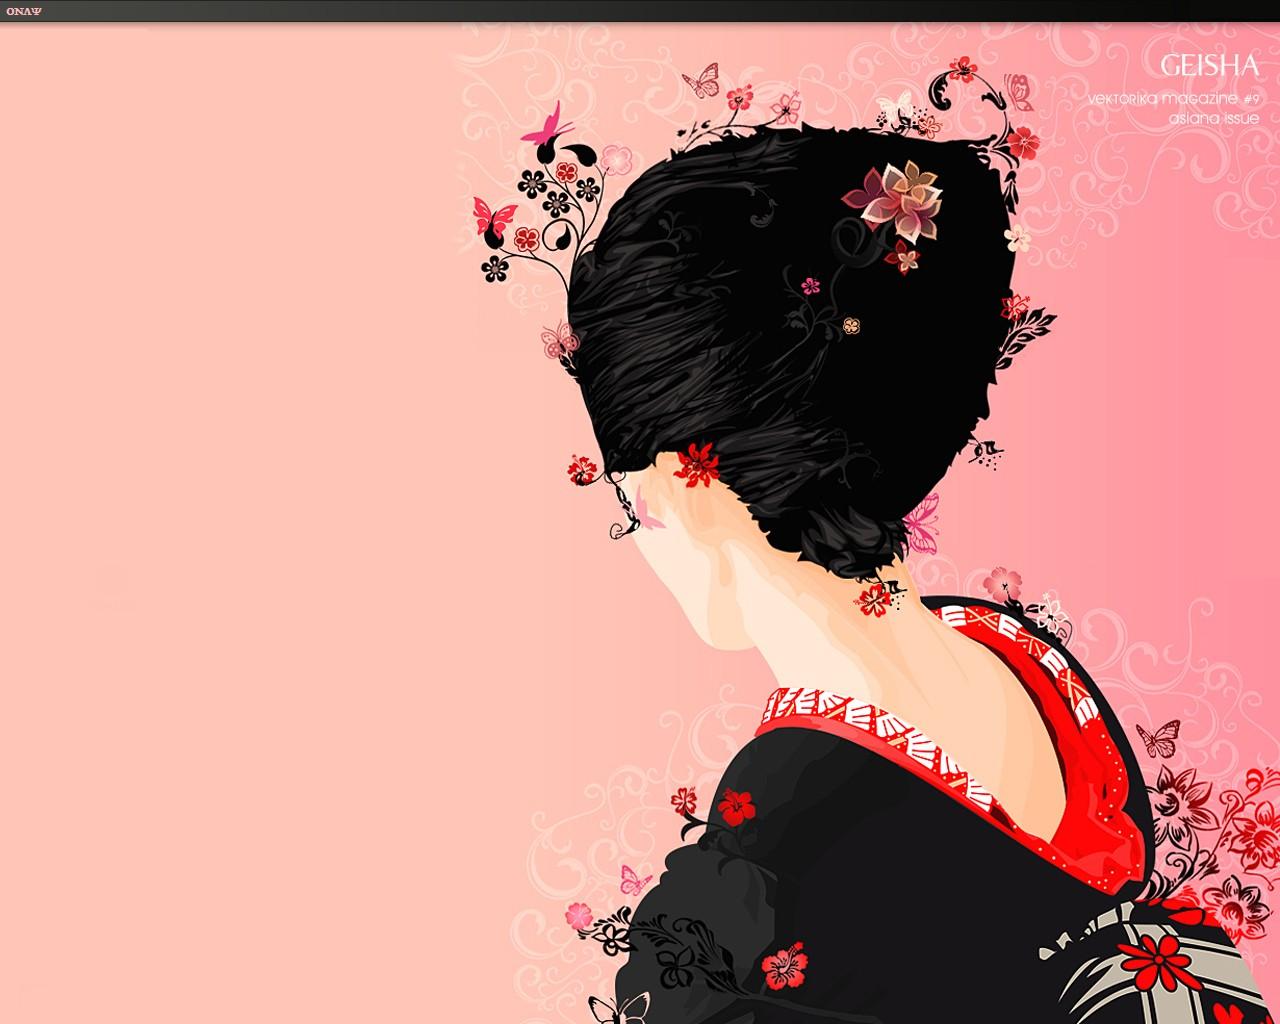 Japanese Geisha Wallpaper 1280x1024 Japanese Geisha Asia 1280x1024